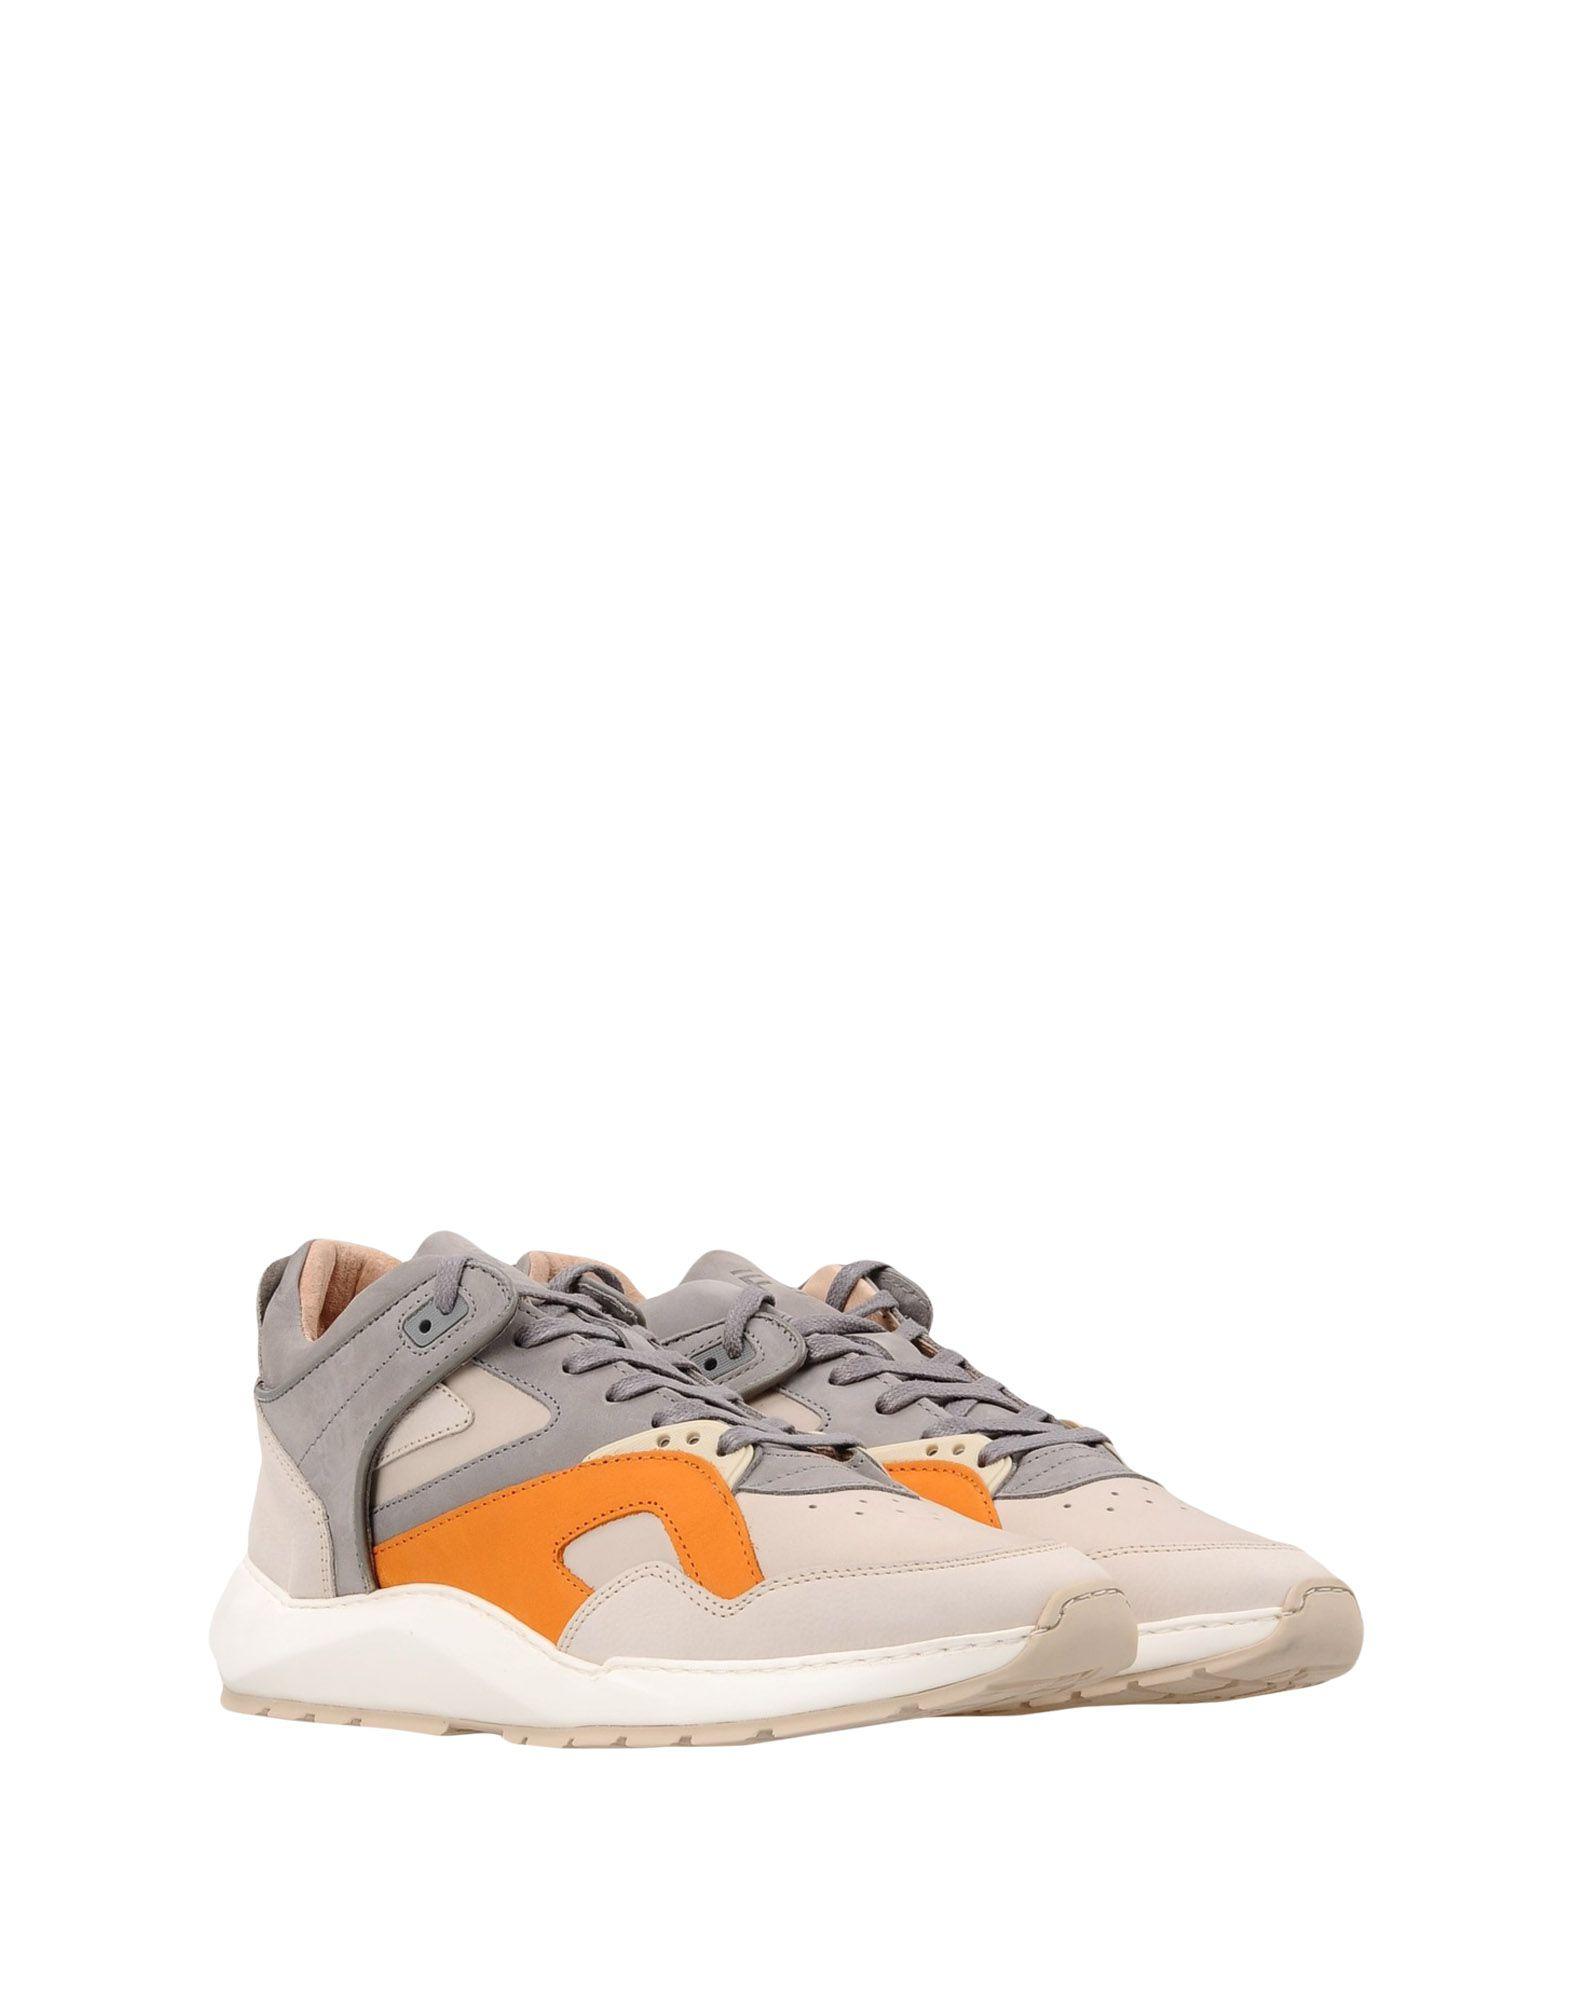 Filling Pieces Sneakers Herren  11419775AF Gute Gute Gute Qualität beliebte Schuhe 3615f5